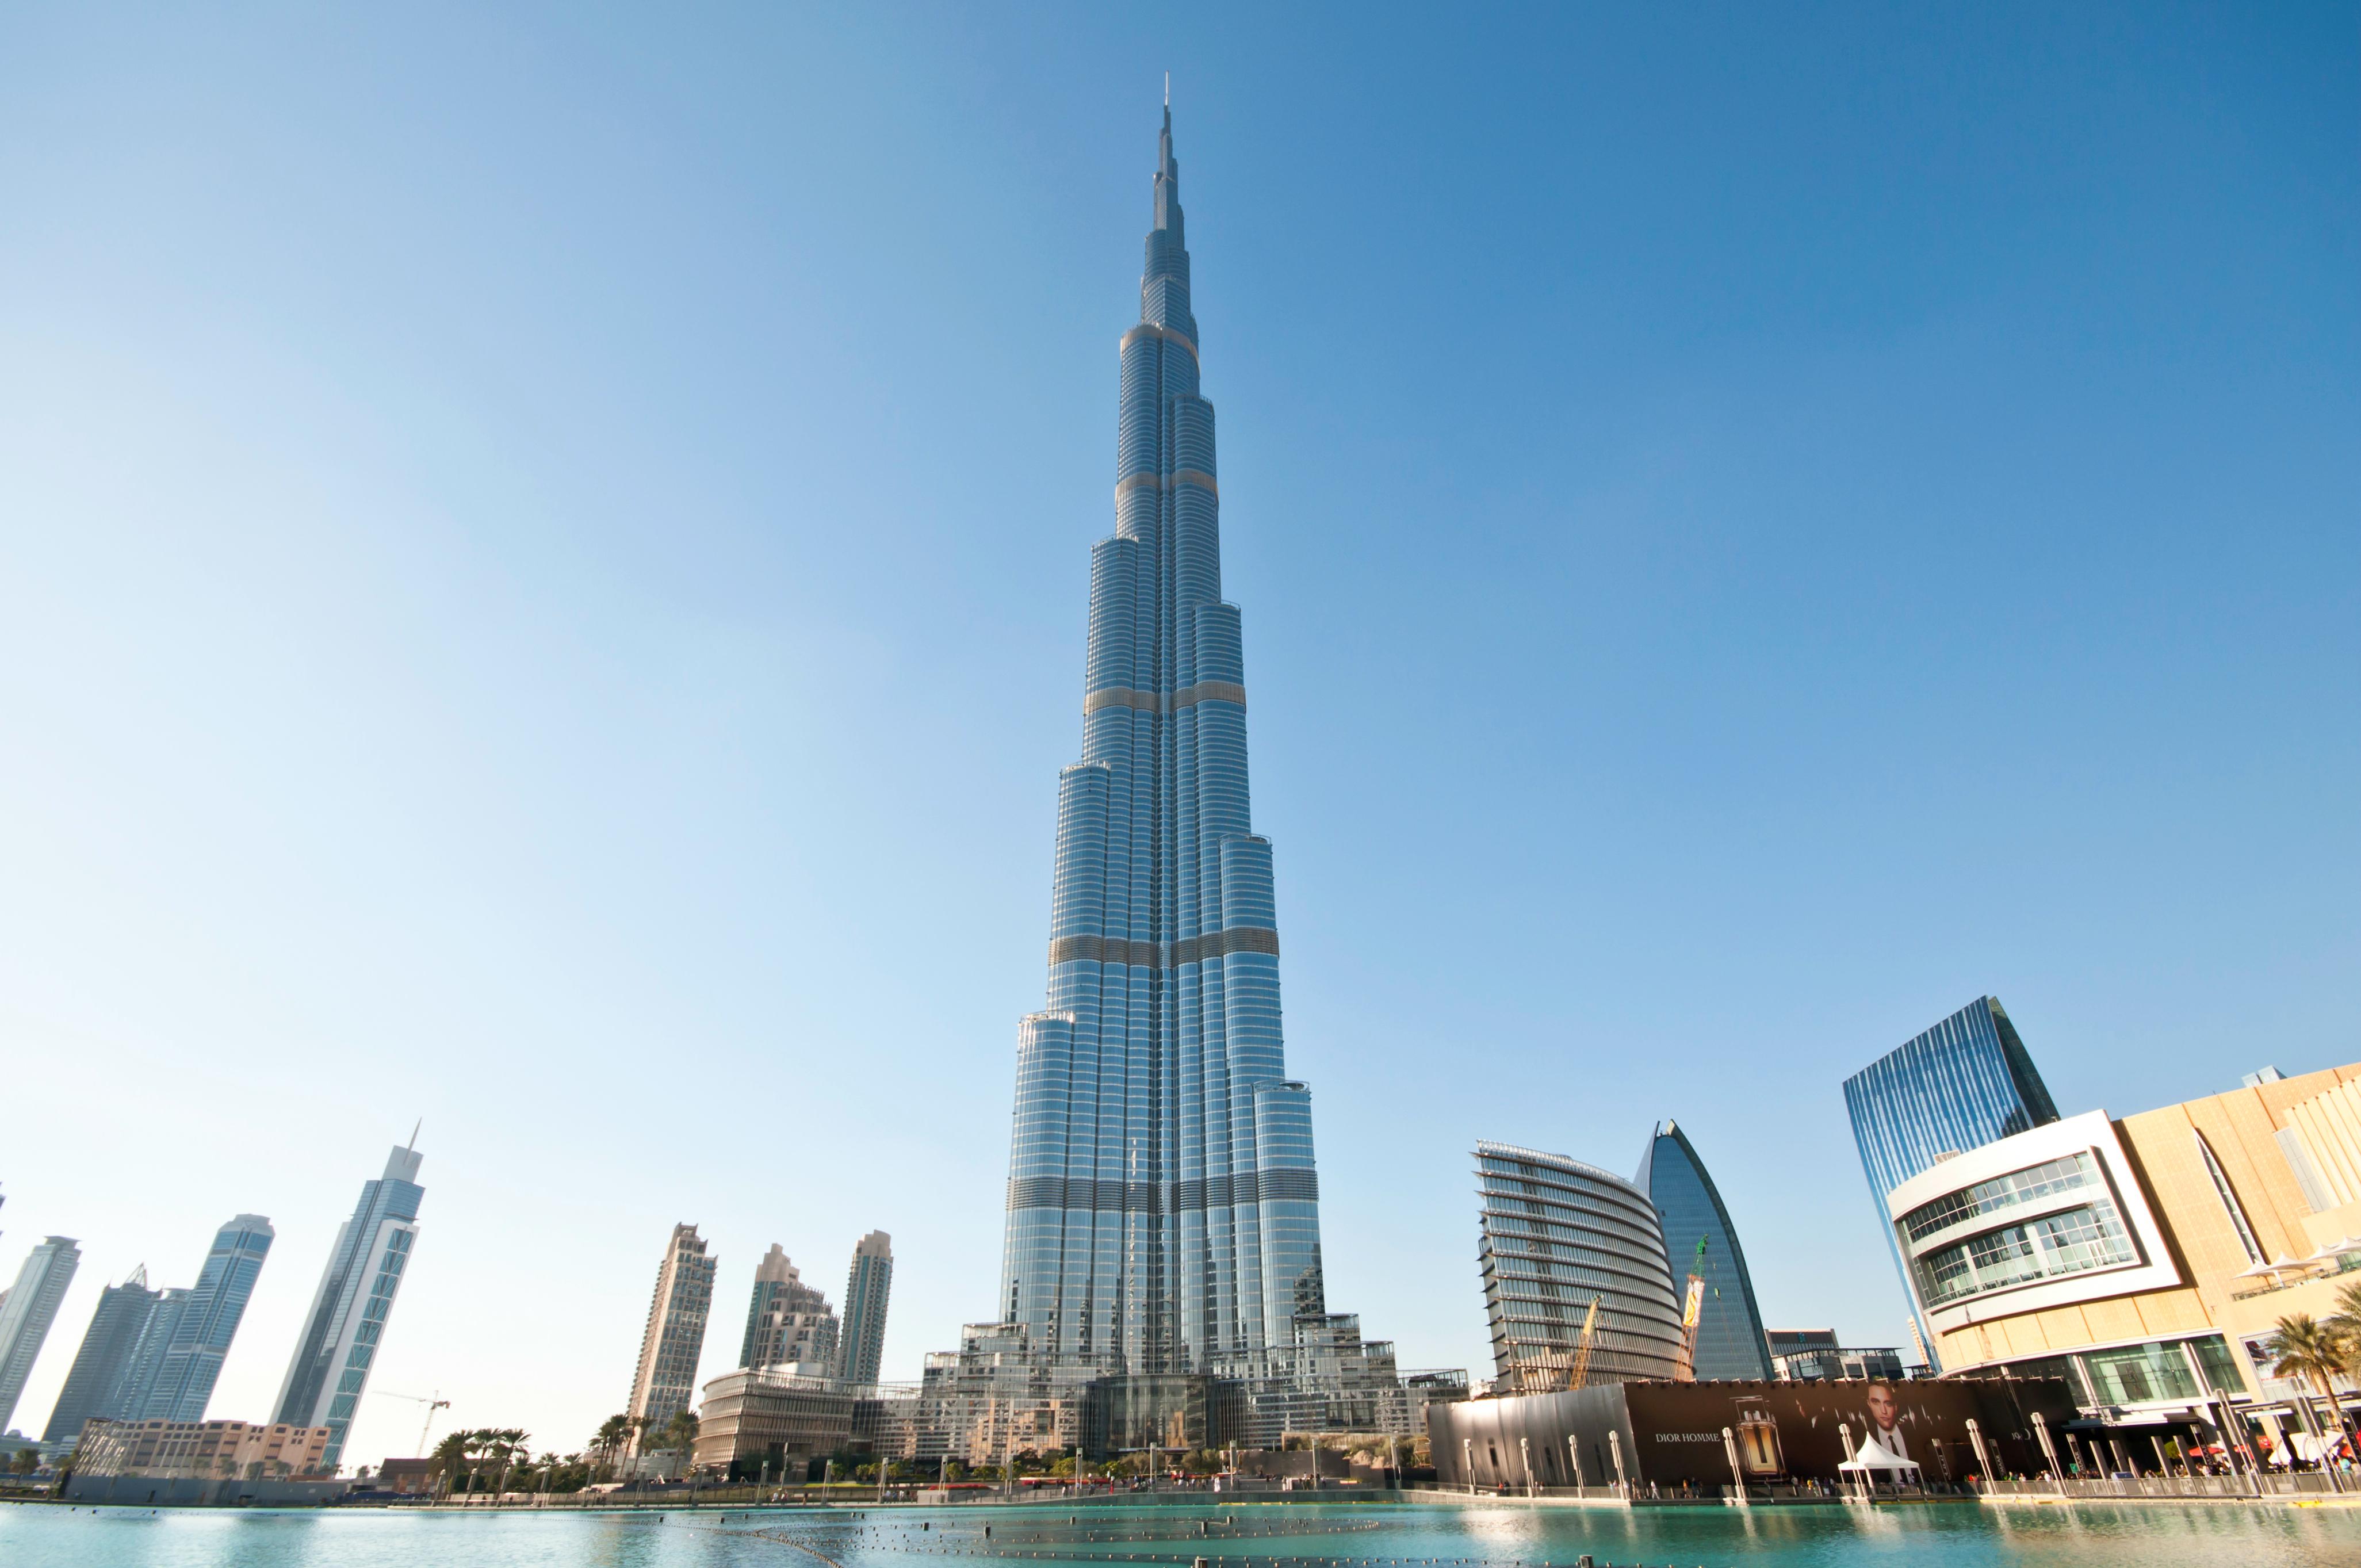 dubai burj khalifa images  Tickets for Burj Khalifa - Dubai | Tiqets